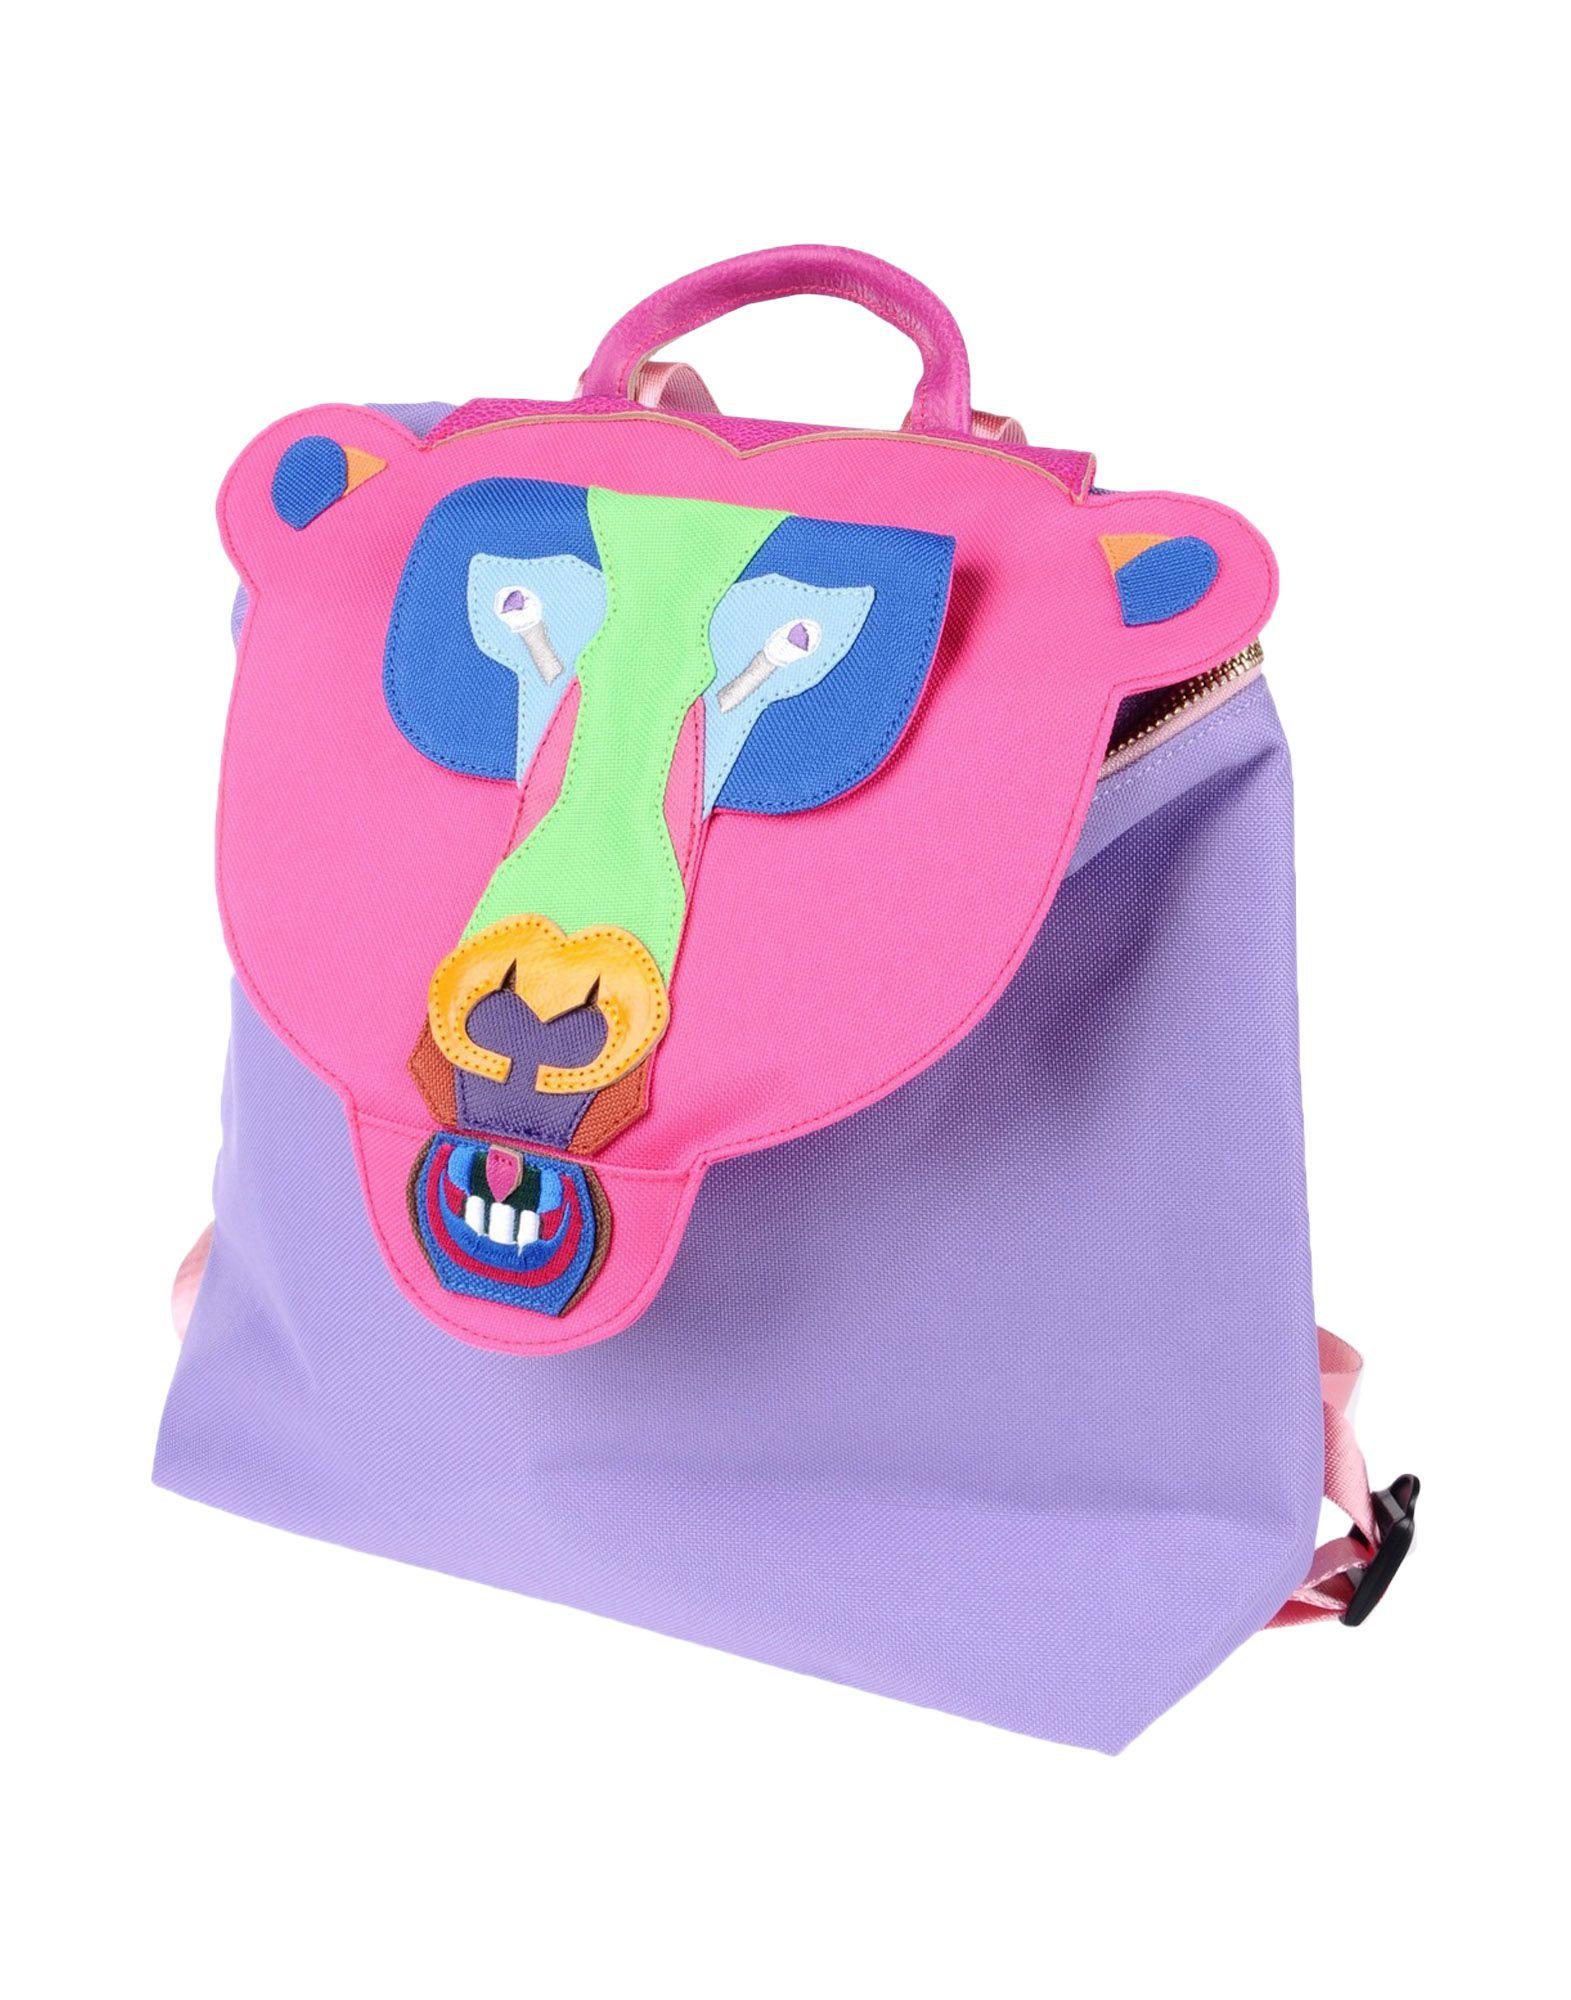 YANG DU Backpack & Fanny Pack in Fuchsia